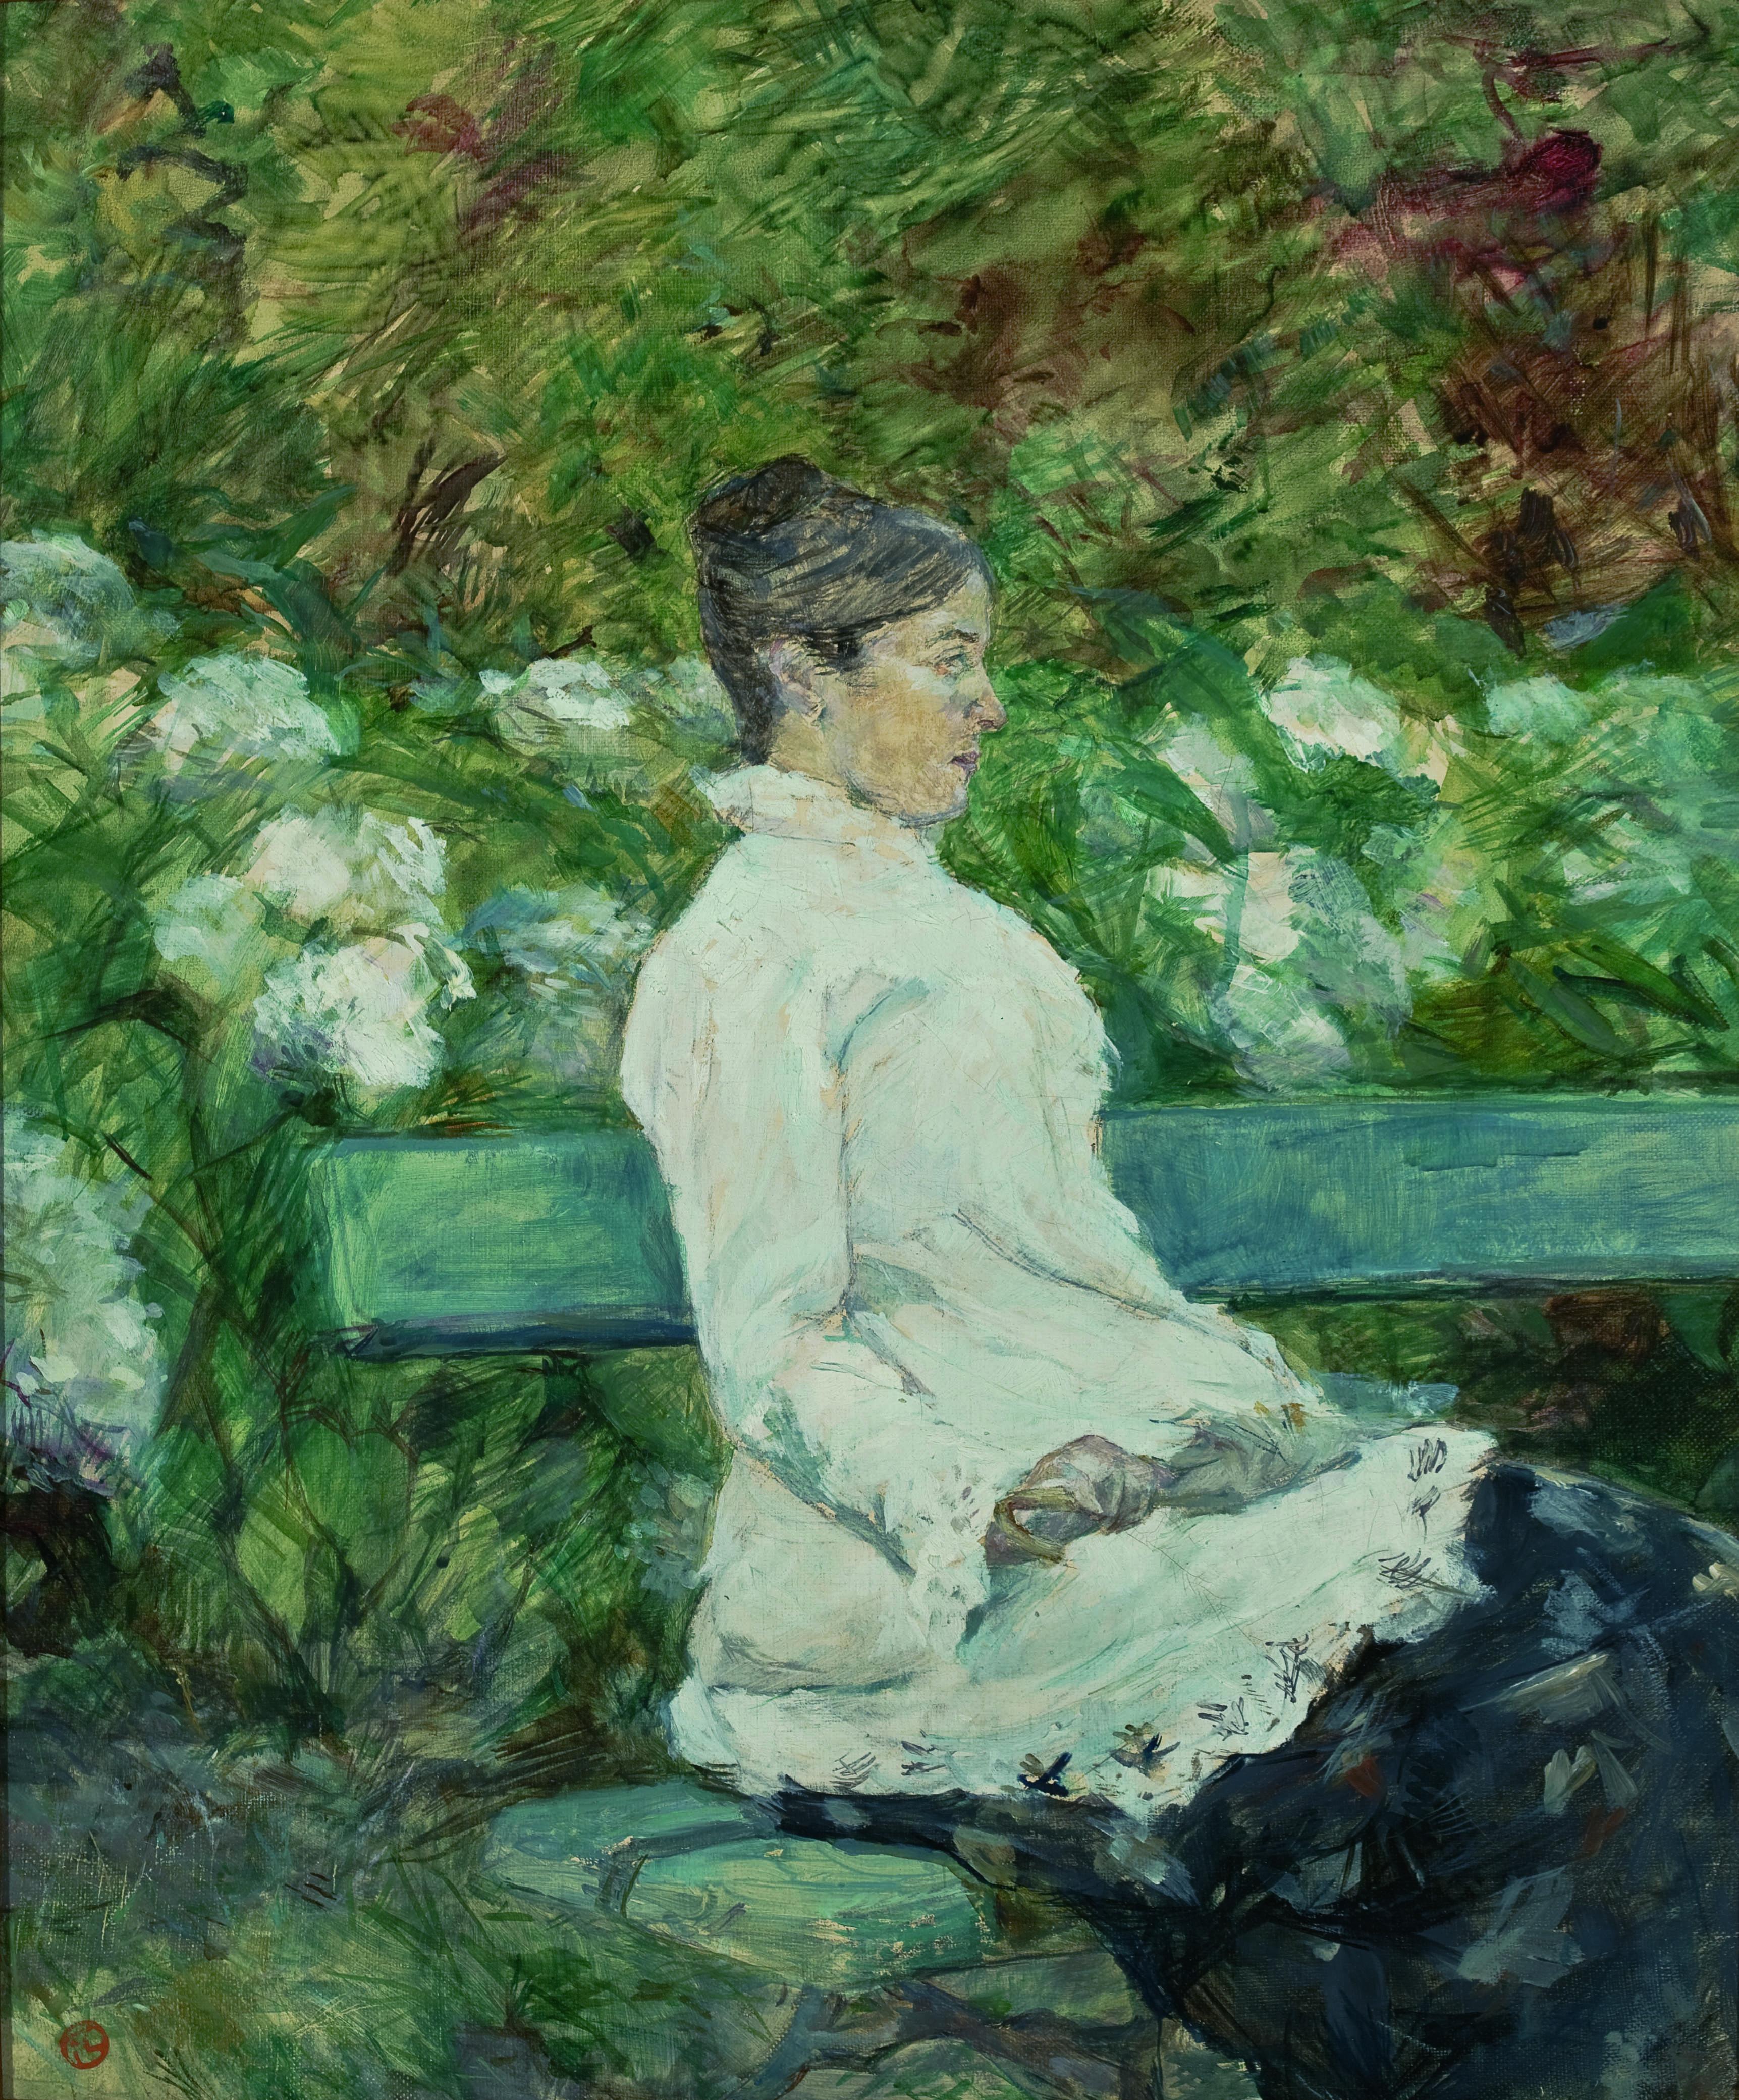 https://upload.wikimedia.org/wikipedia/commons/a/a5/Toulouse-Lautrec_-_Ad%C3%A8le_de_Toulouse-Lautrec.jpg